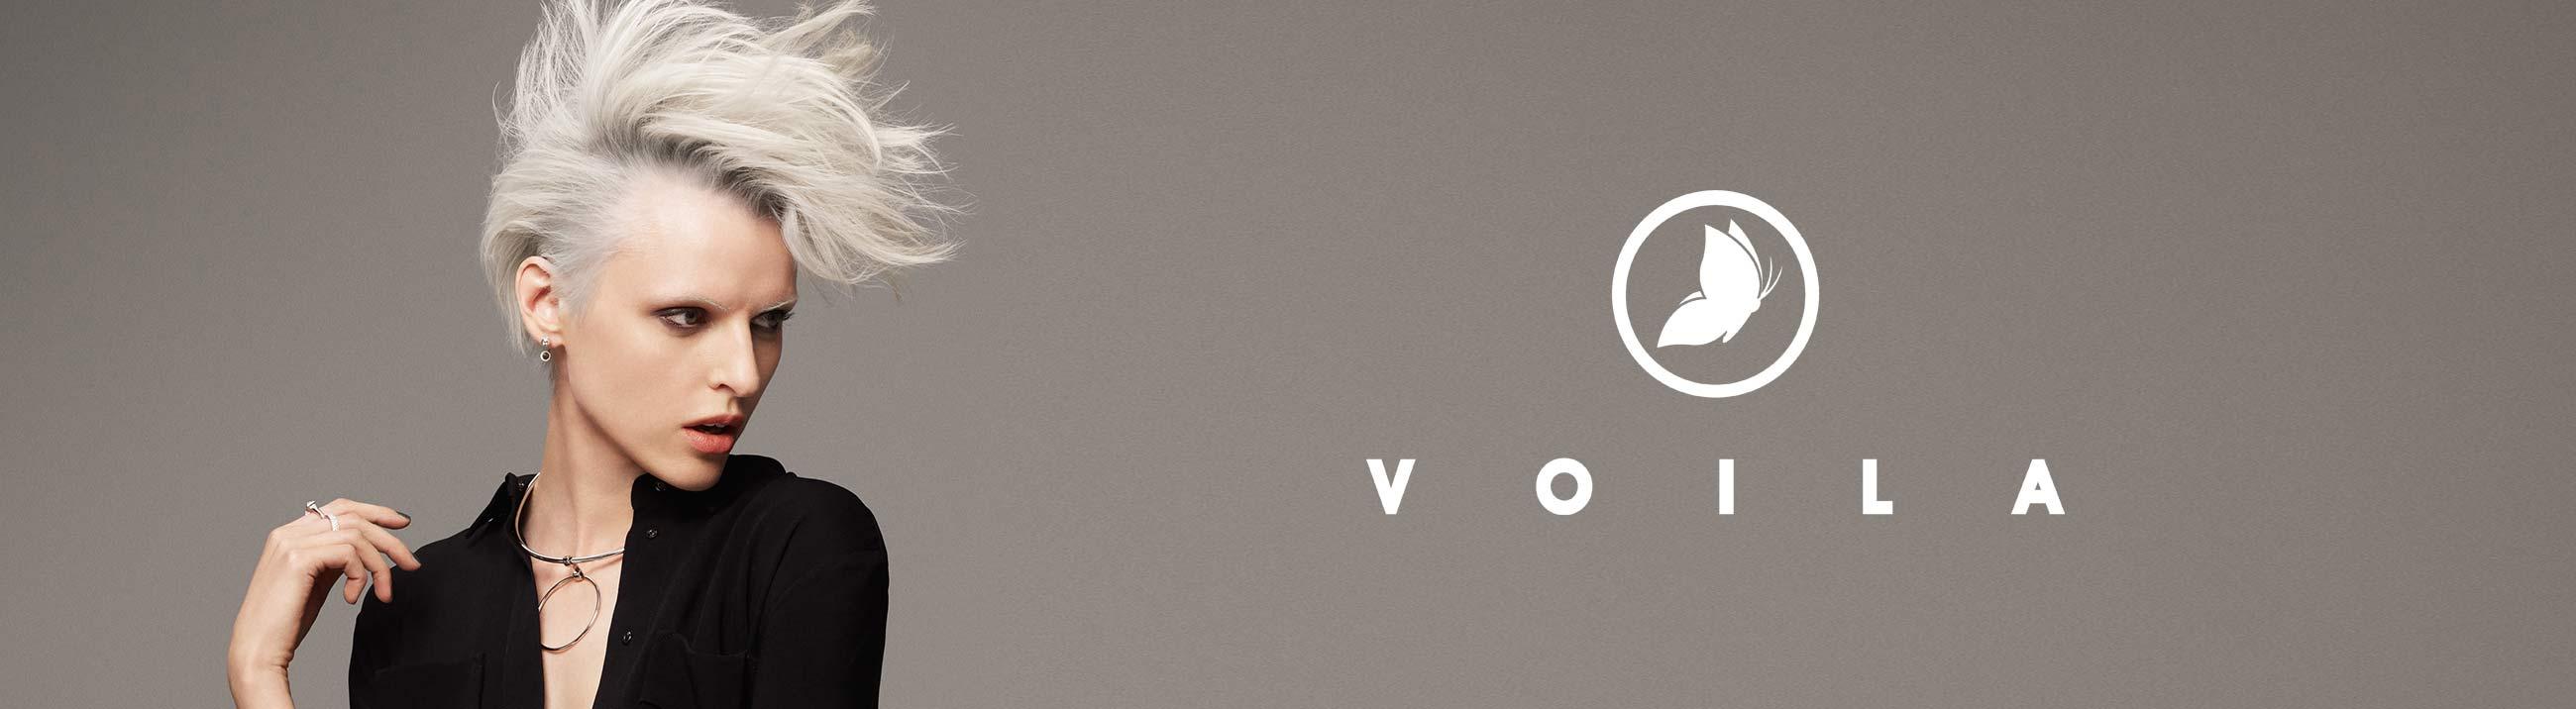 Contact voila head office voila the best hair salon - Voila institute of hair design kitchener ...